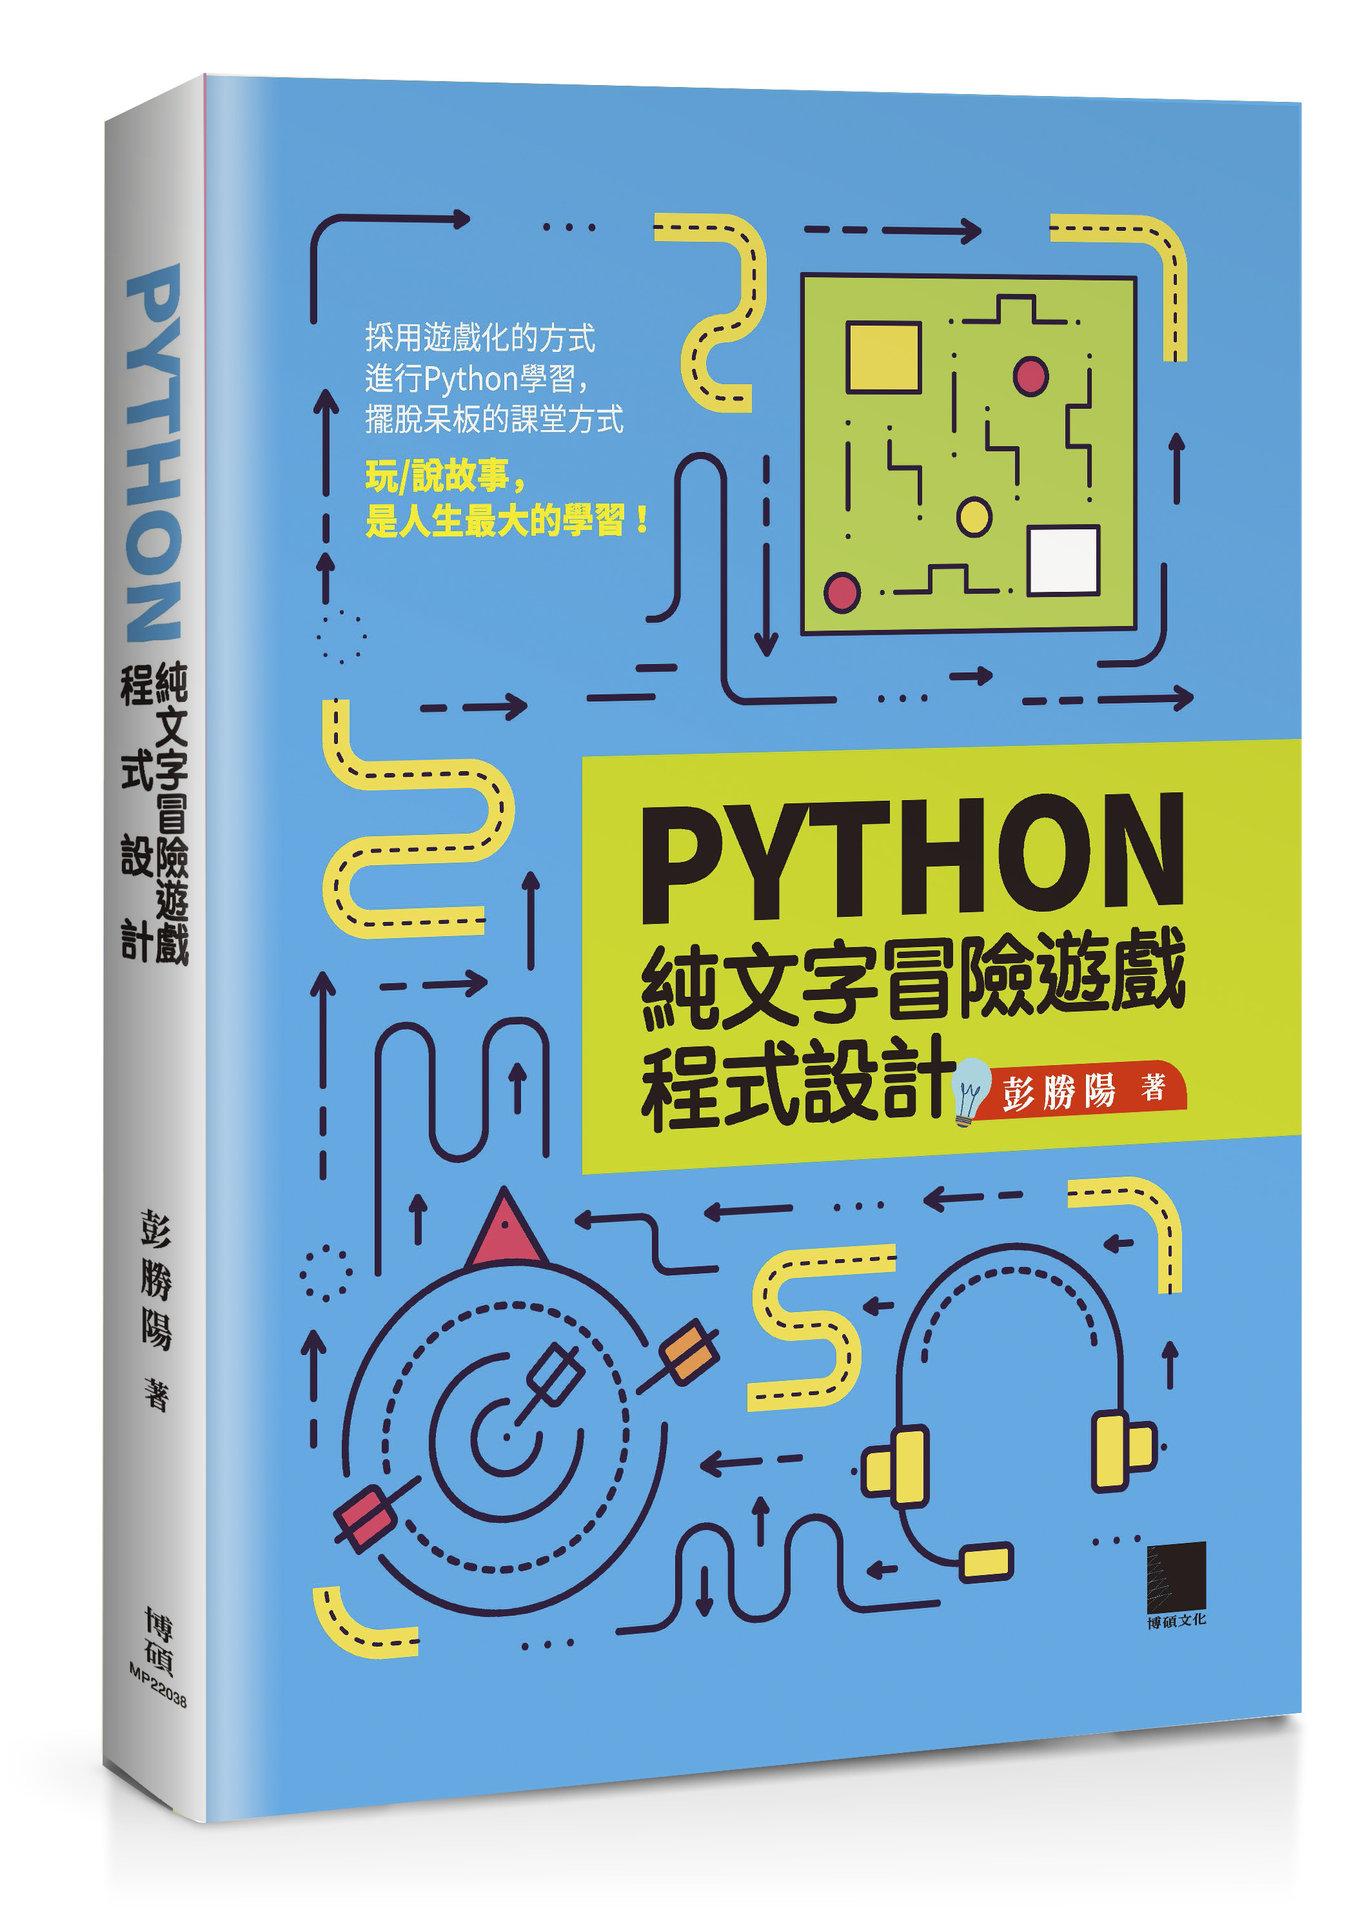 Python 純文字冒險遊戲程式設計-preview-1